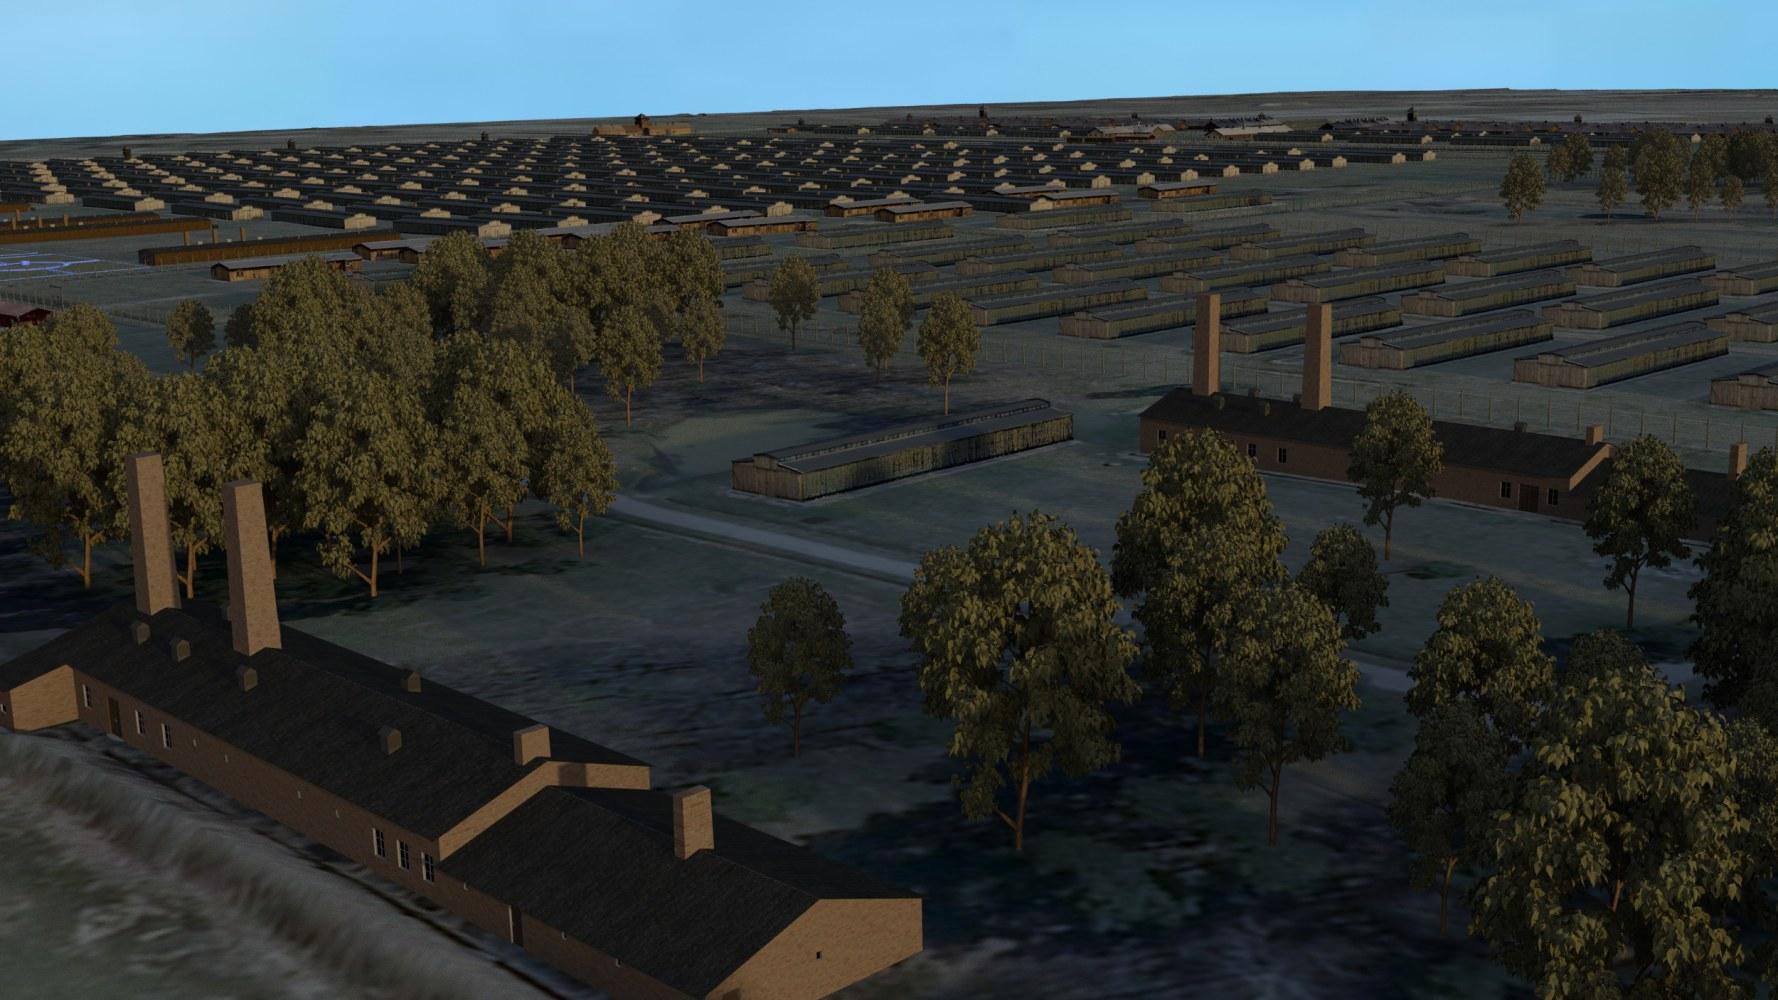 Remodel Software Germany Uses Vr Model Of Auschwitz Birkenau To Catch Nazis